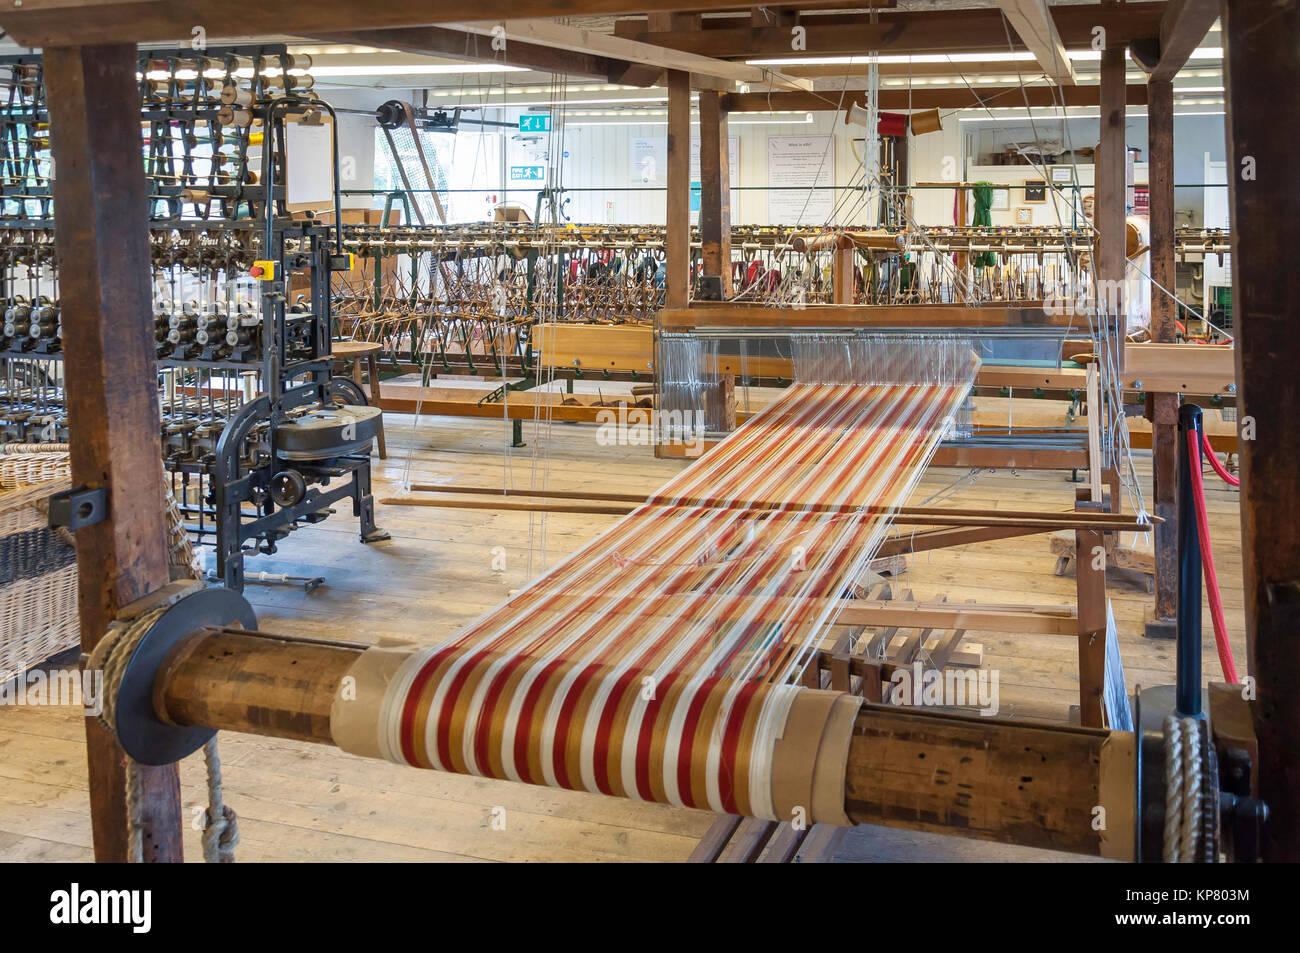 Fabricación de telares de seda y equipo en Whitchurch molino de Seda, Whitchurch, Hampshire, Inglaterra, Reino Imagen De Stock